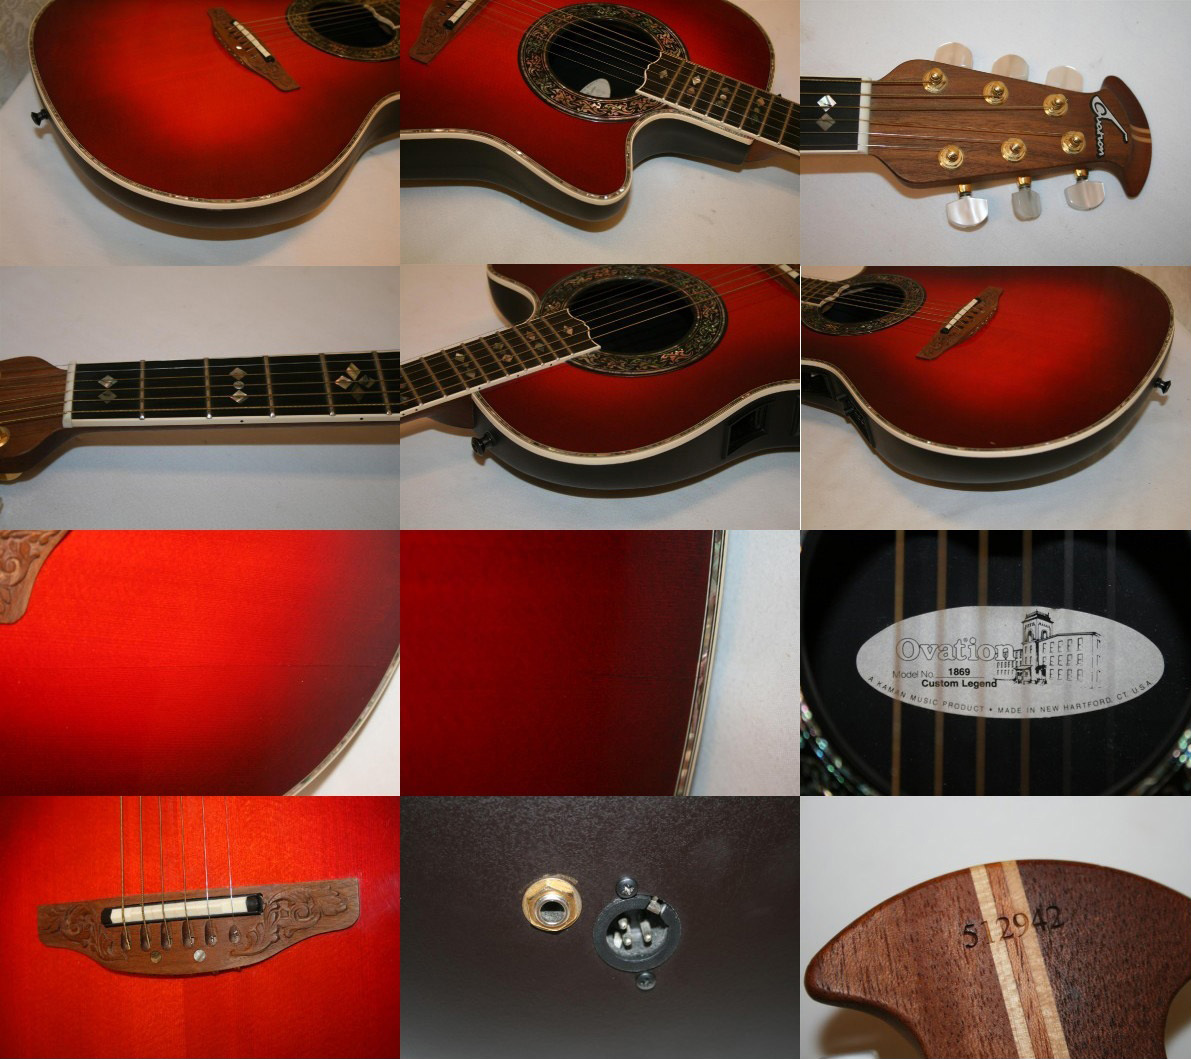 Ovation Varias Fotos - Clases de Guitarra Barcelona